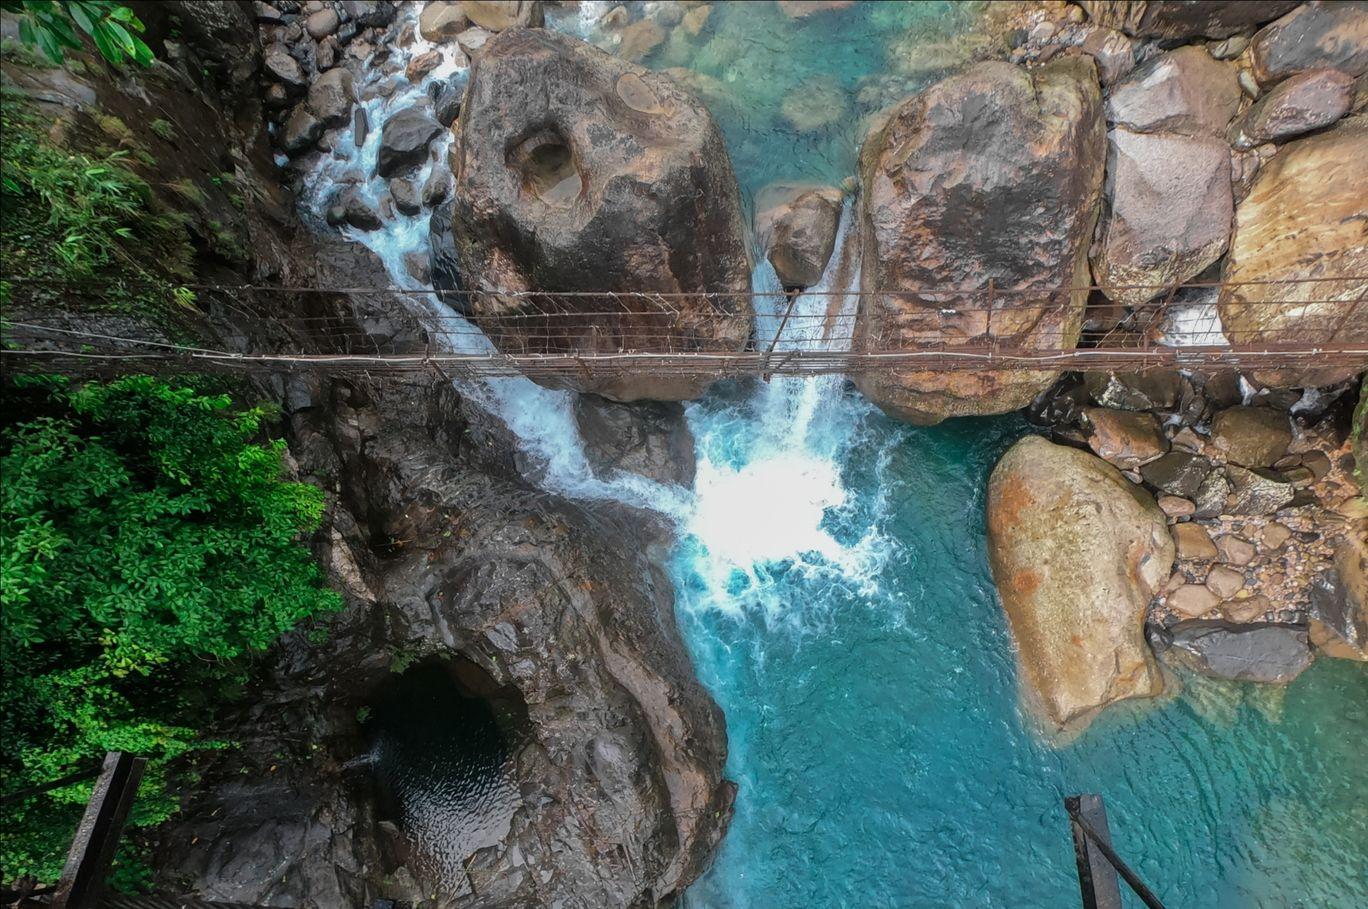 Photo of Nongriat Iron Rod Hanging Bridge By d dash